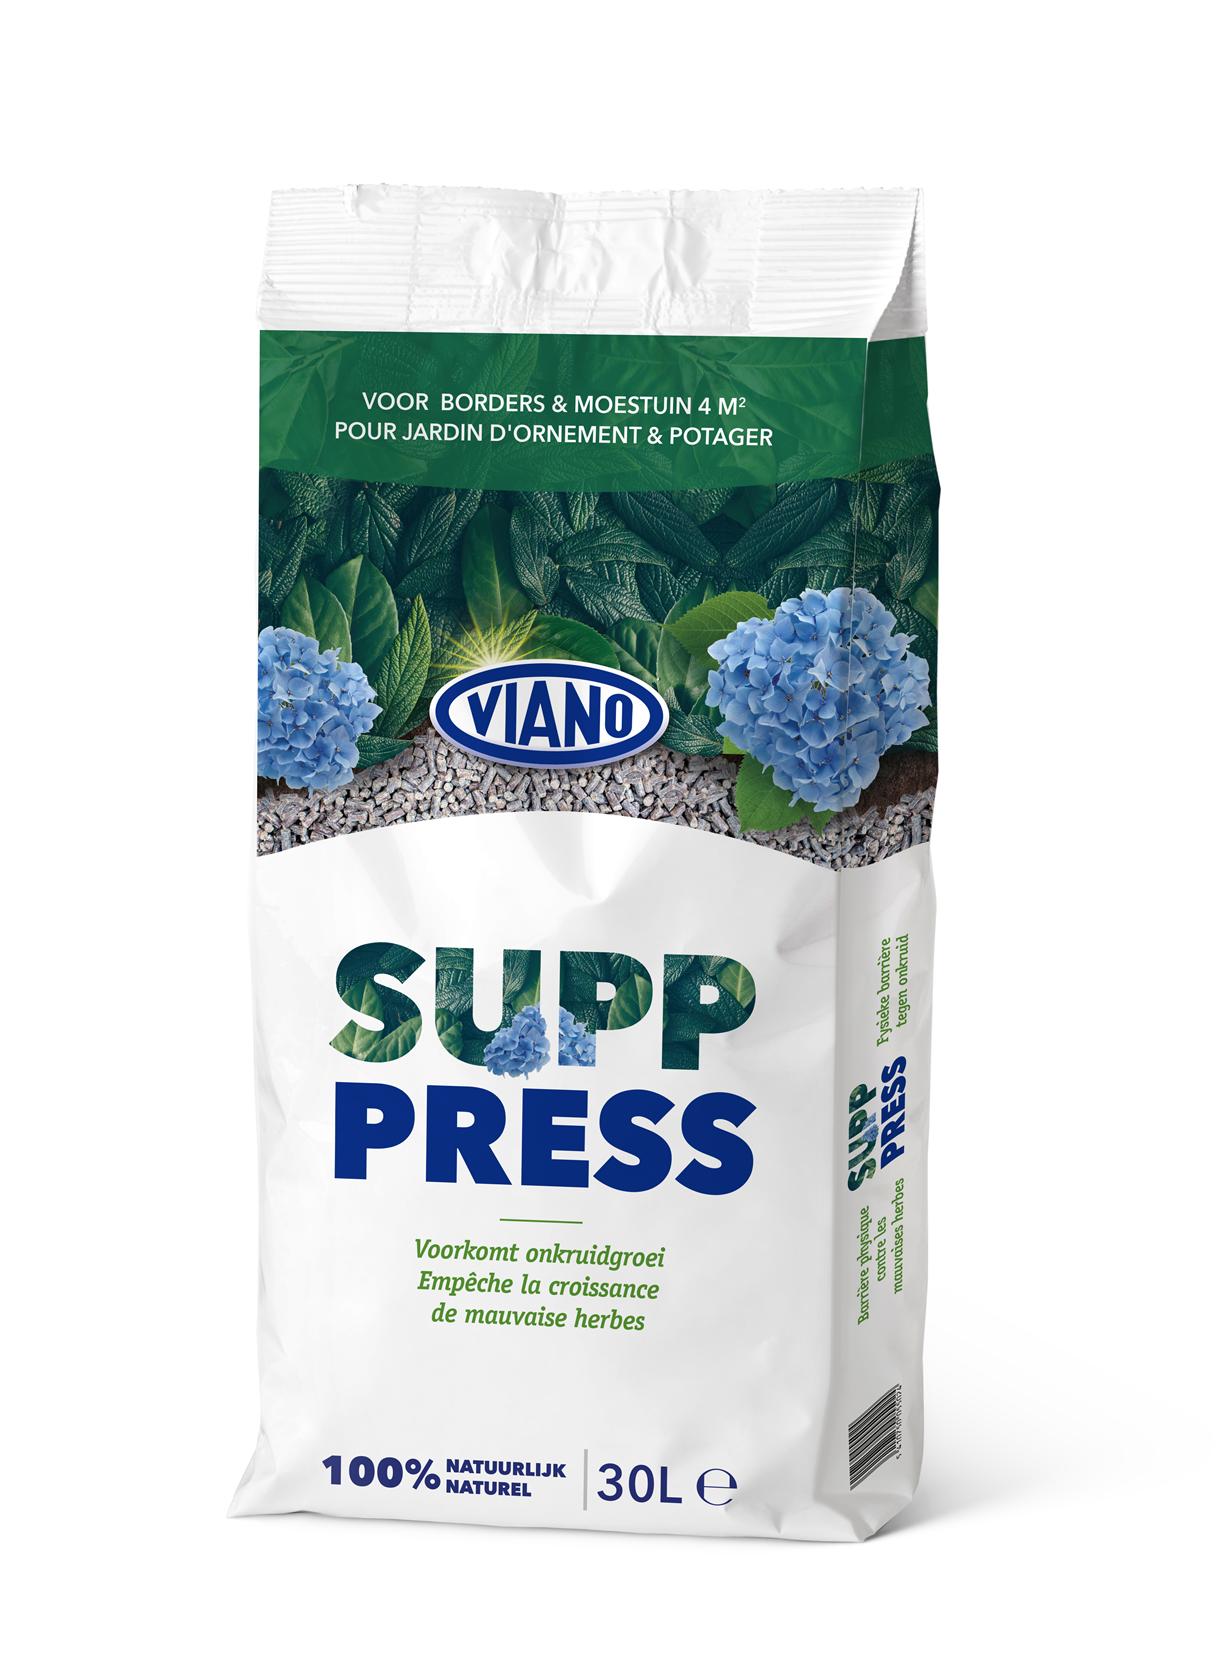 SUP-Press-Onkruidgroei-onkruid-voorkomen-30L